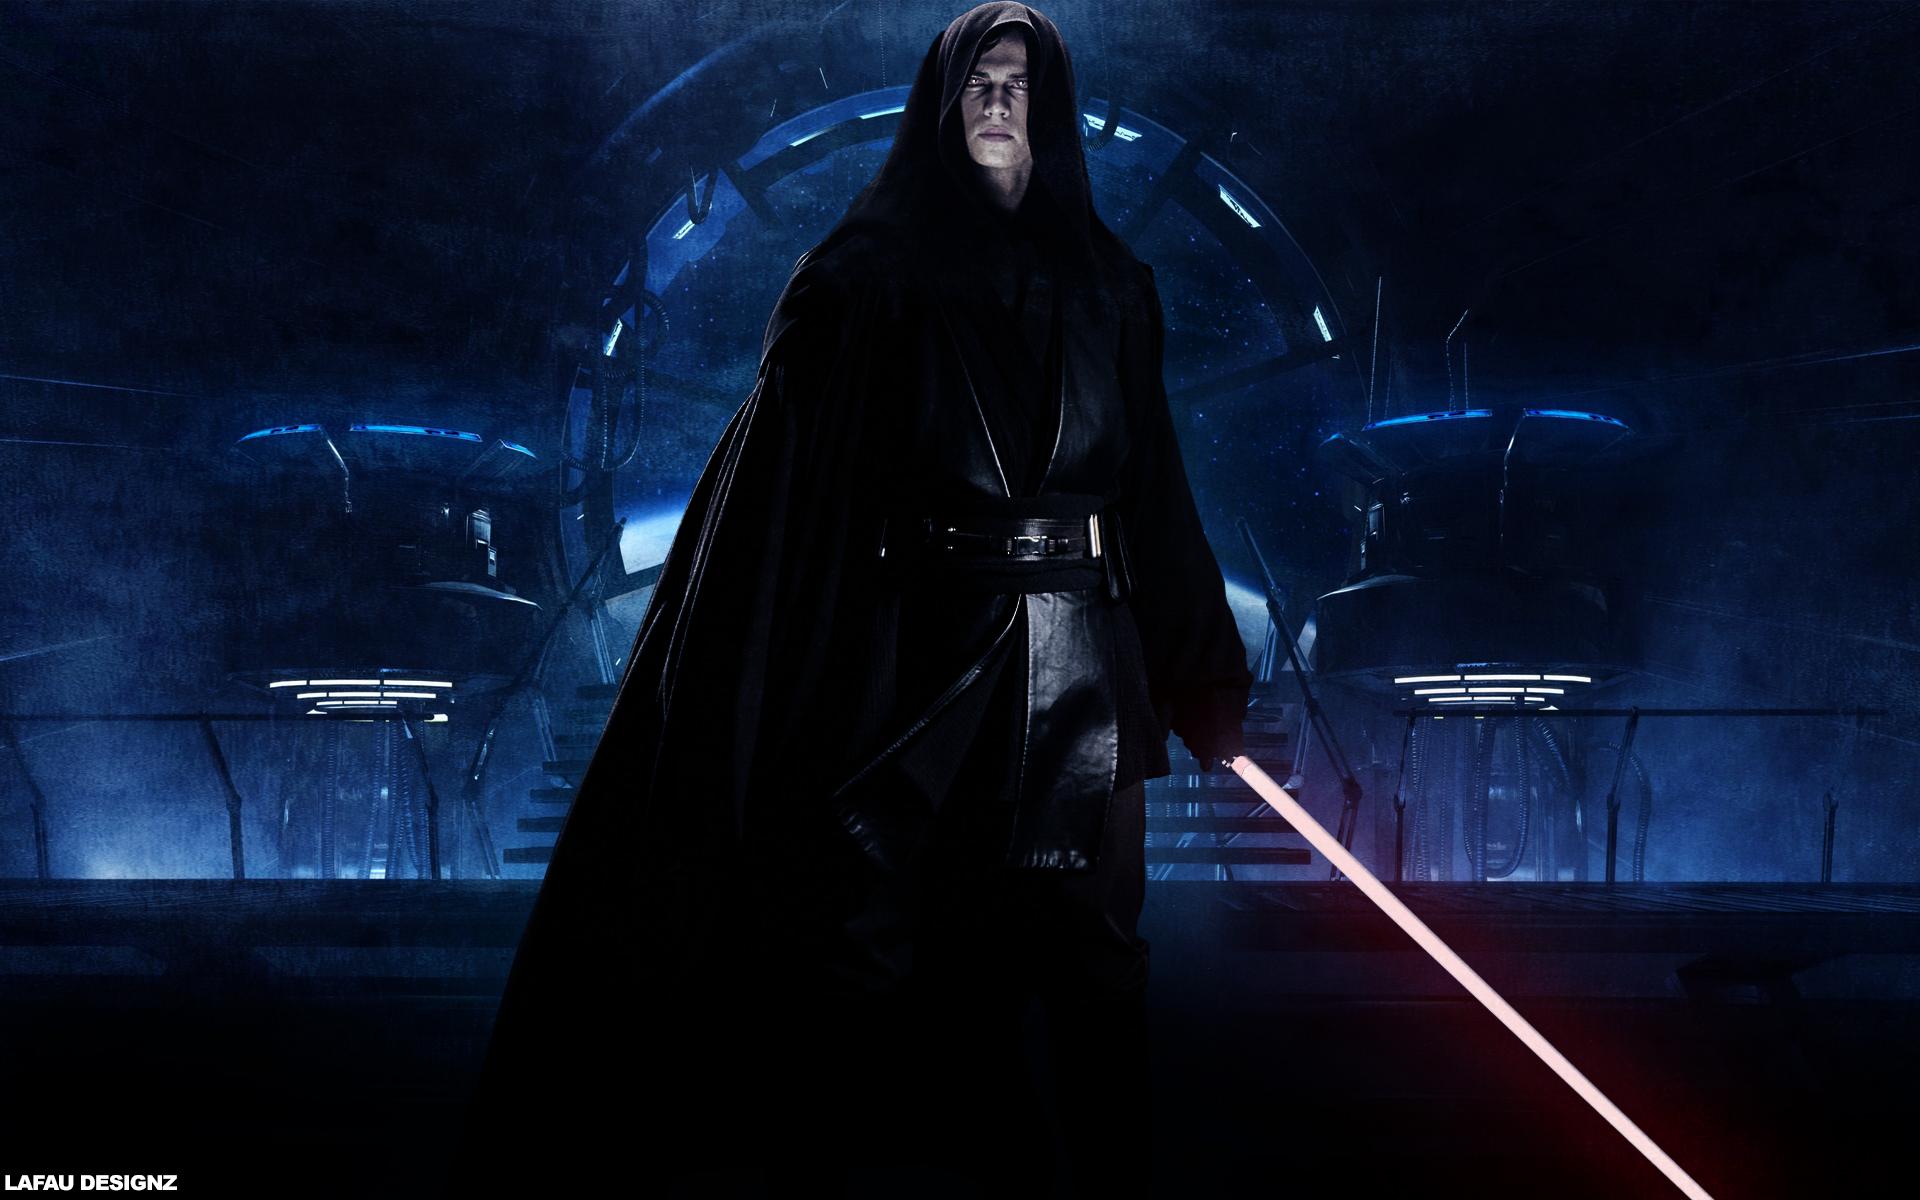 Star Wars Anakin Skywalker Wallpaper: Anakin Skywalker // Star Wars // Wallpaper By Lafaudesignz